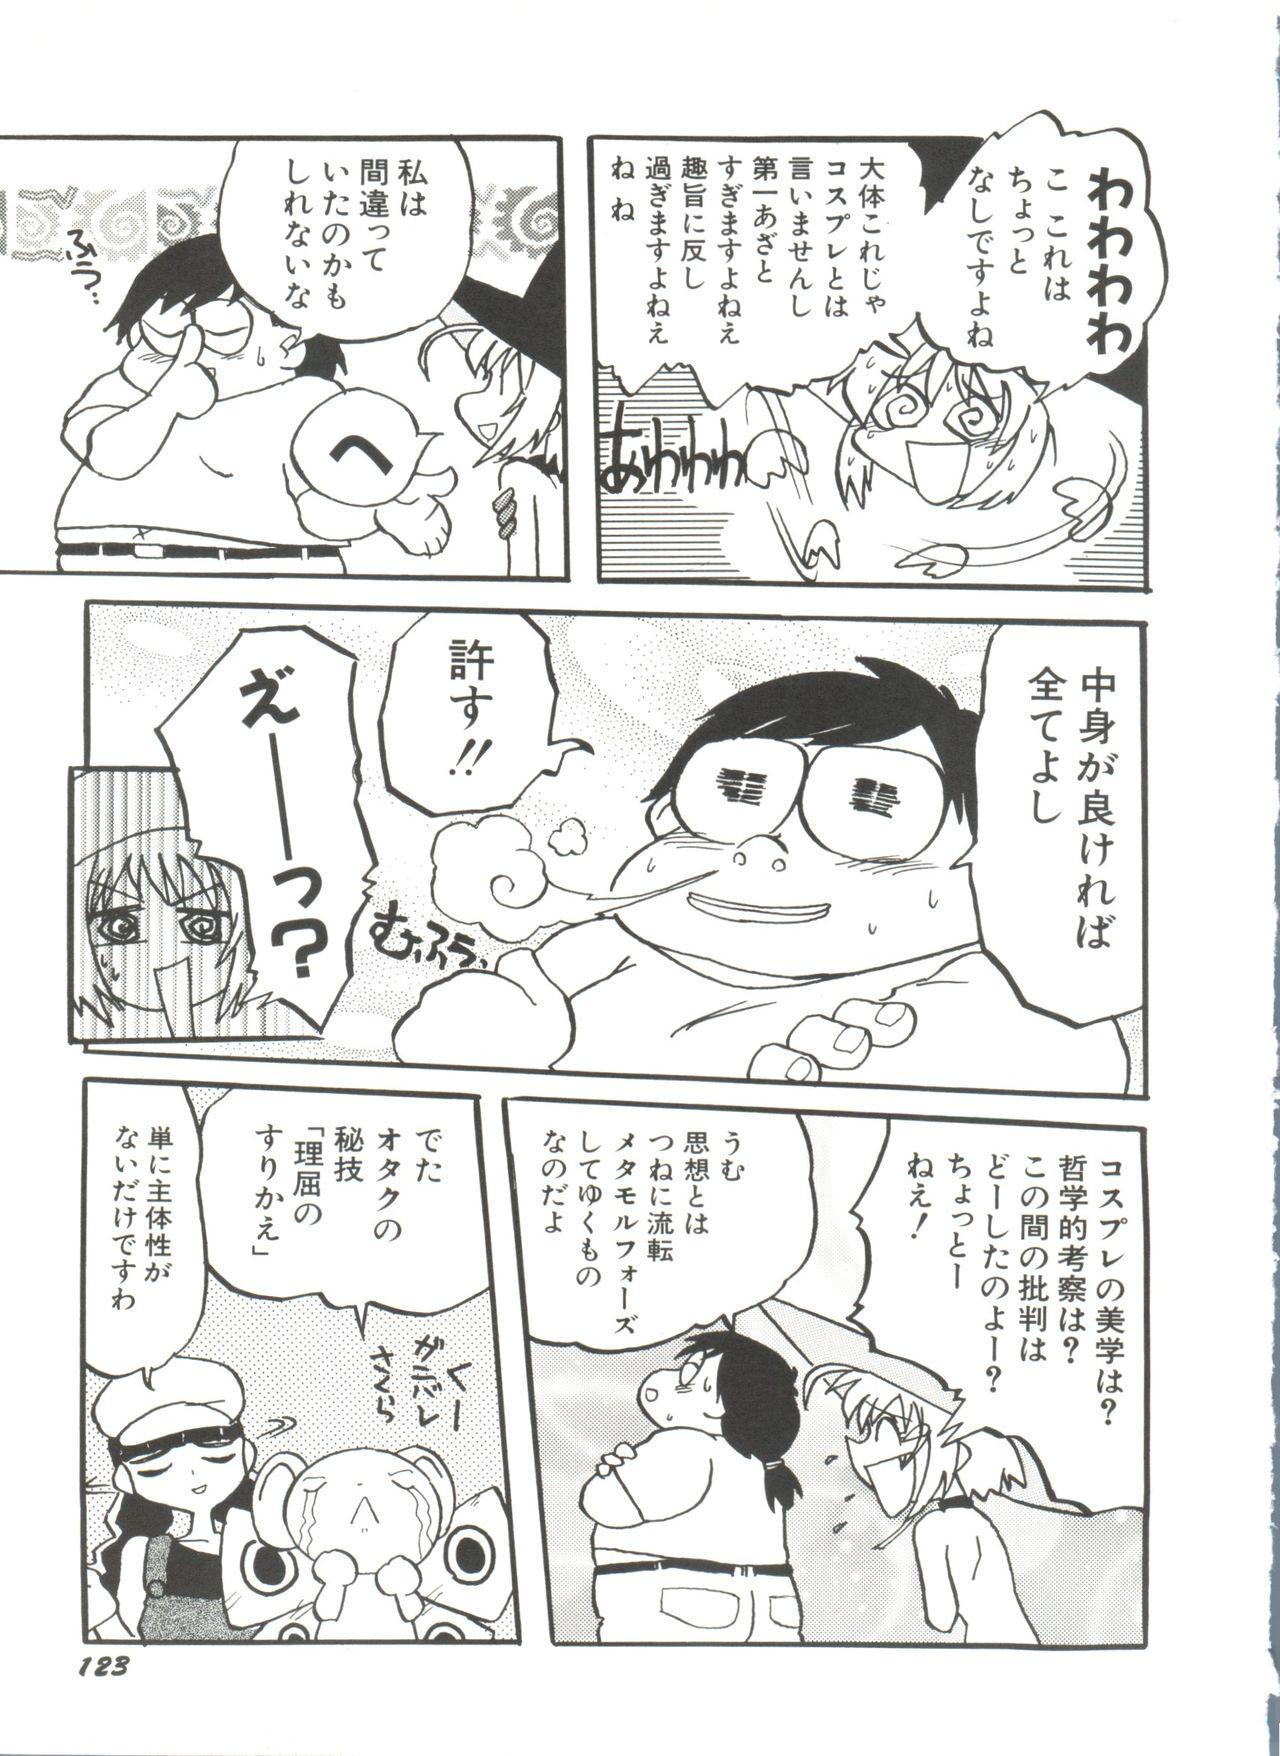 [Anthology] Denei Tamatebako 8 - Utakata no Tenshi-tachi II (Various) 124